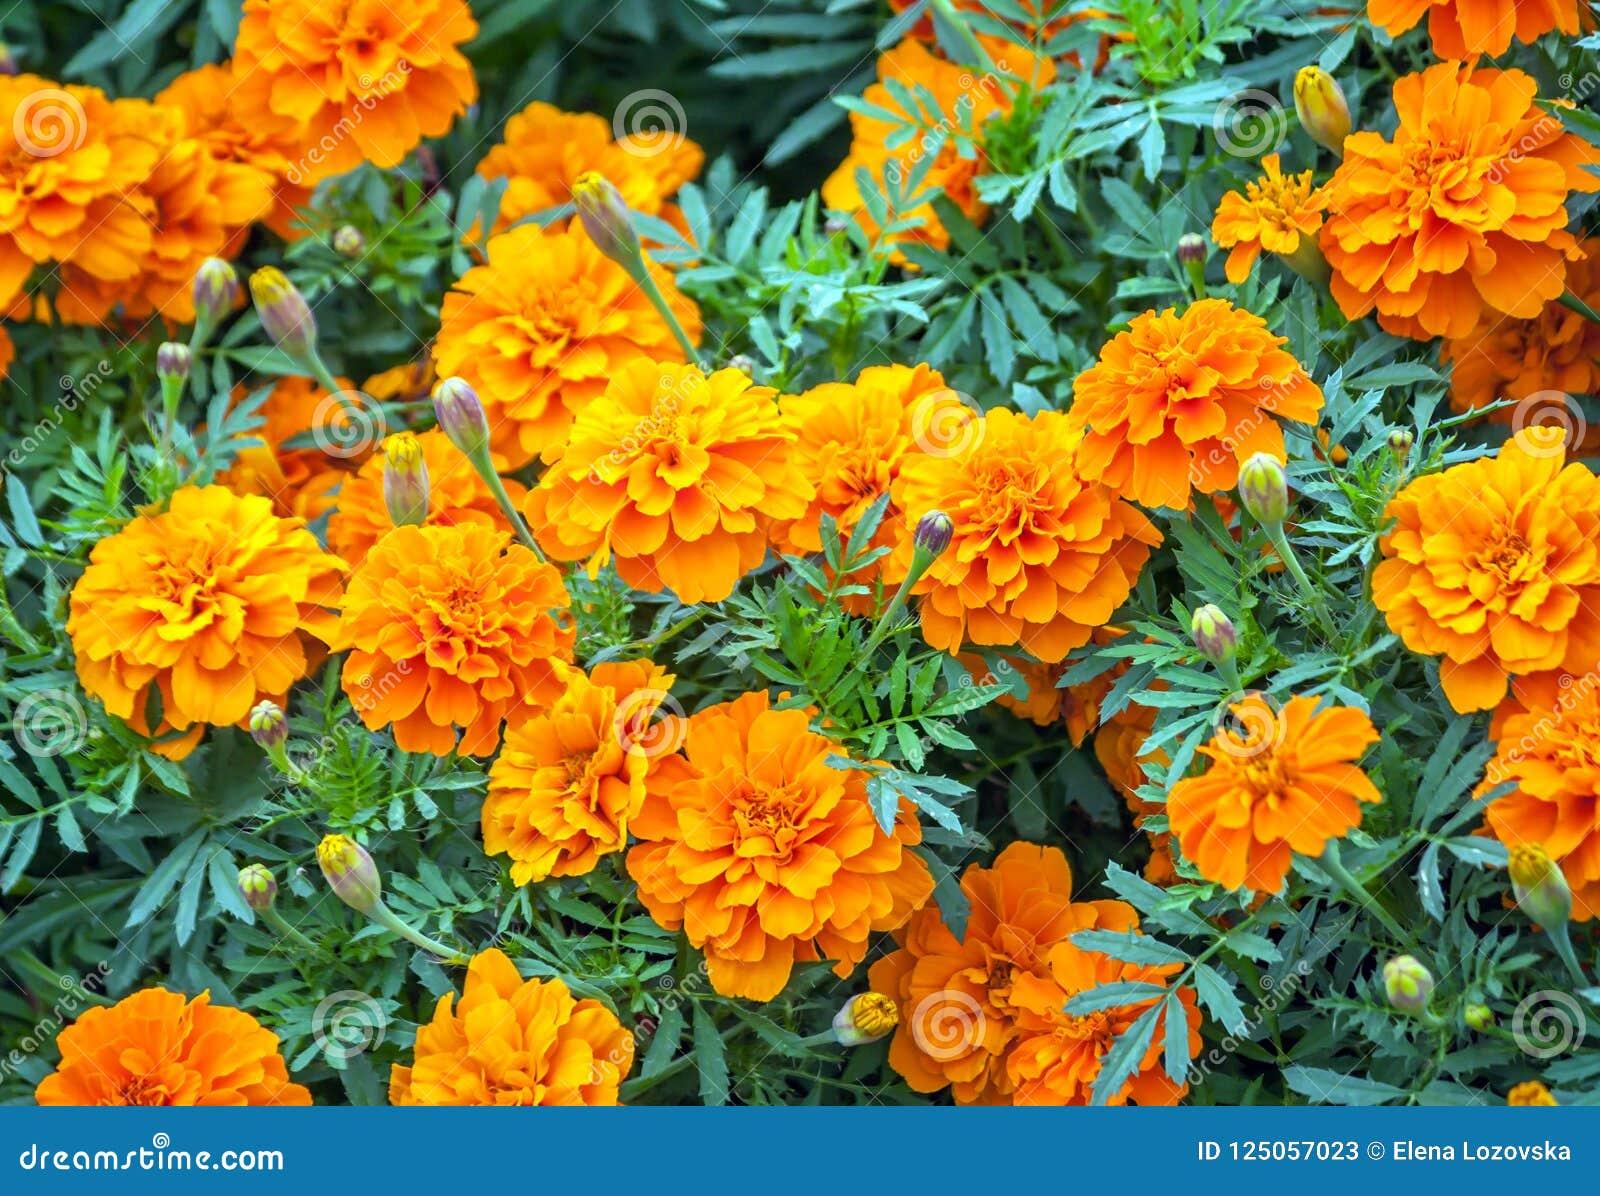 Tagetes A Variety Of Flowers Bonanza Deep Orange Symbol Of